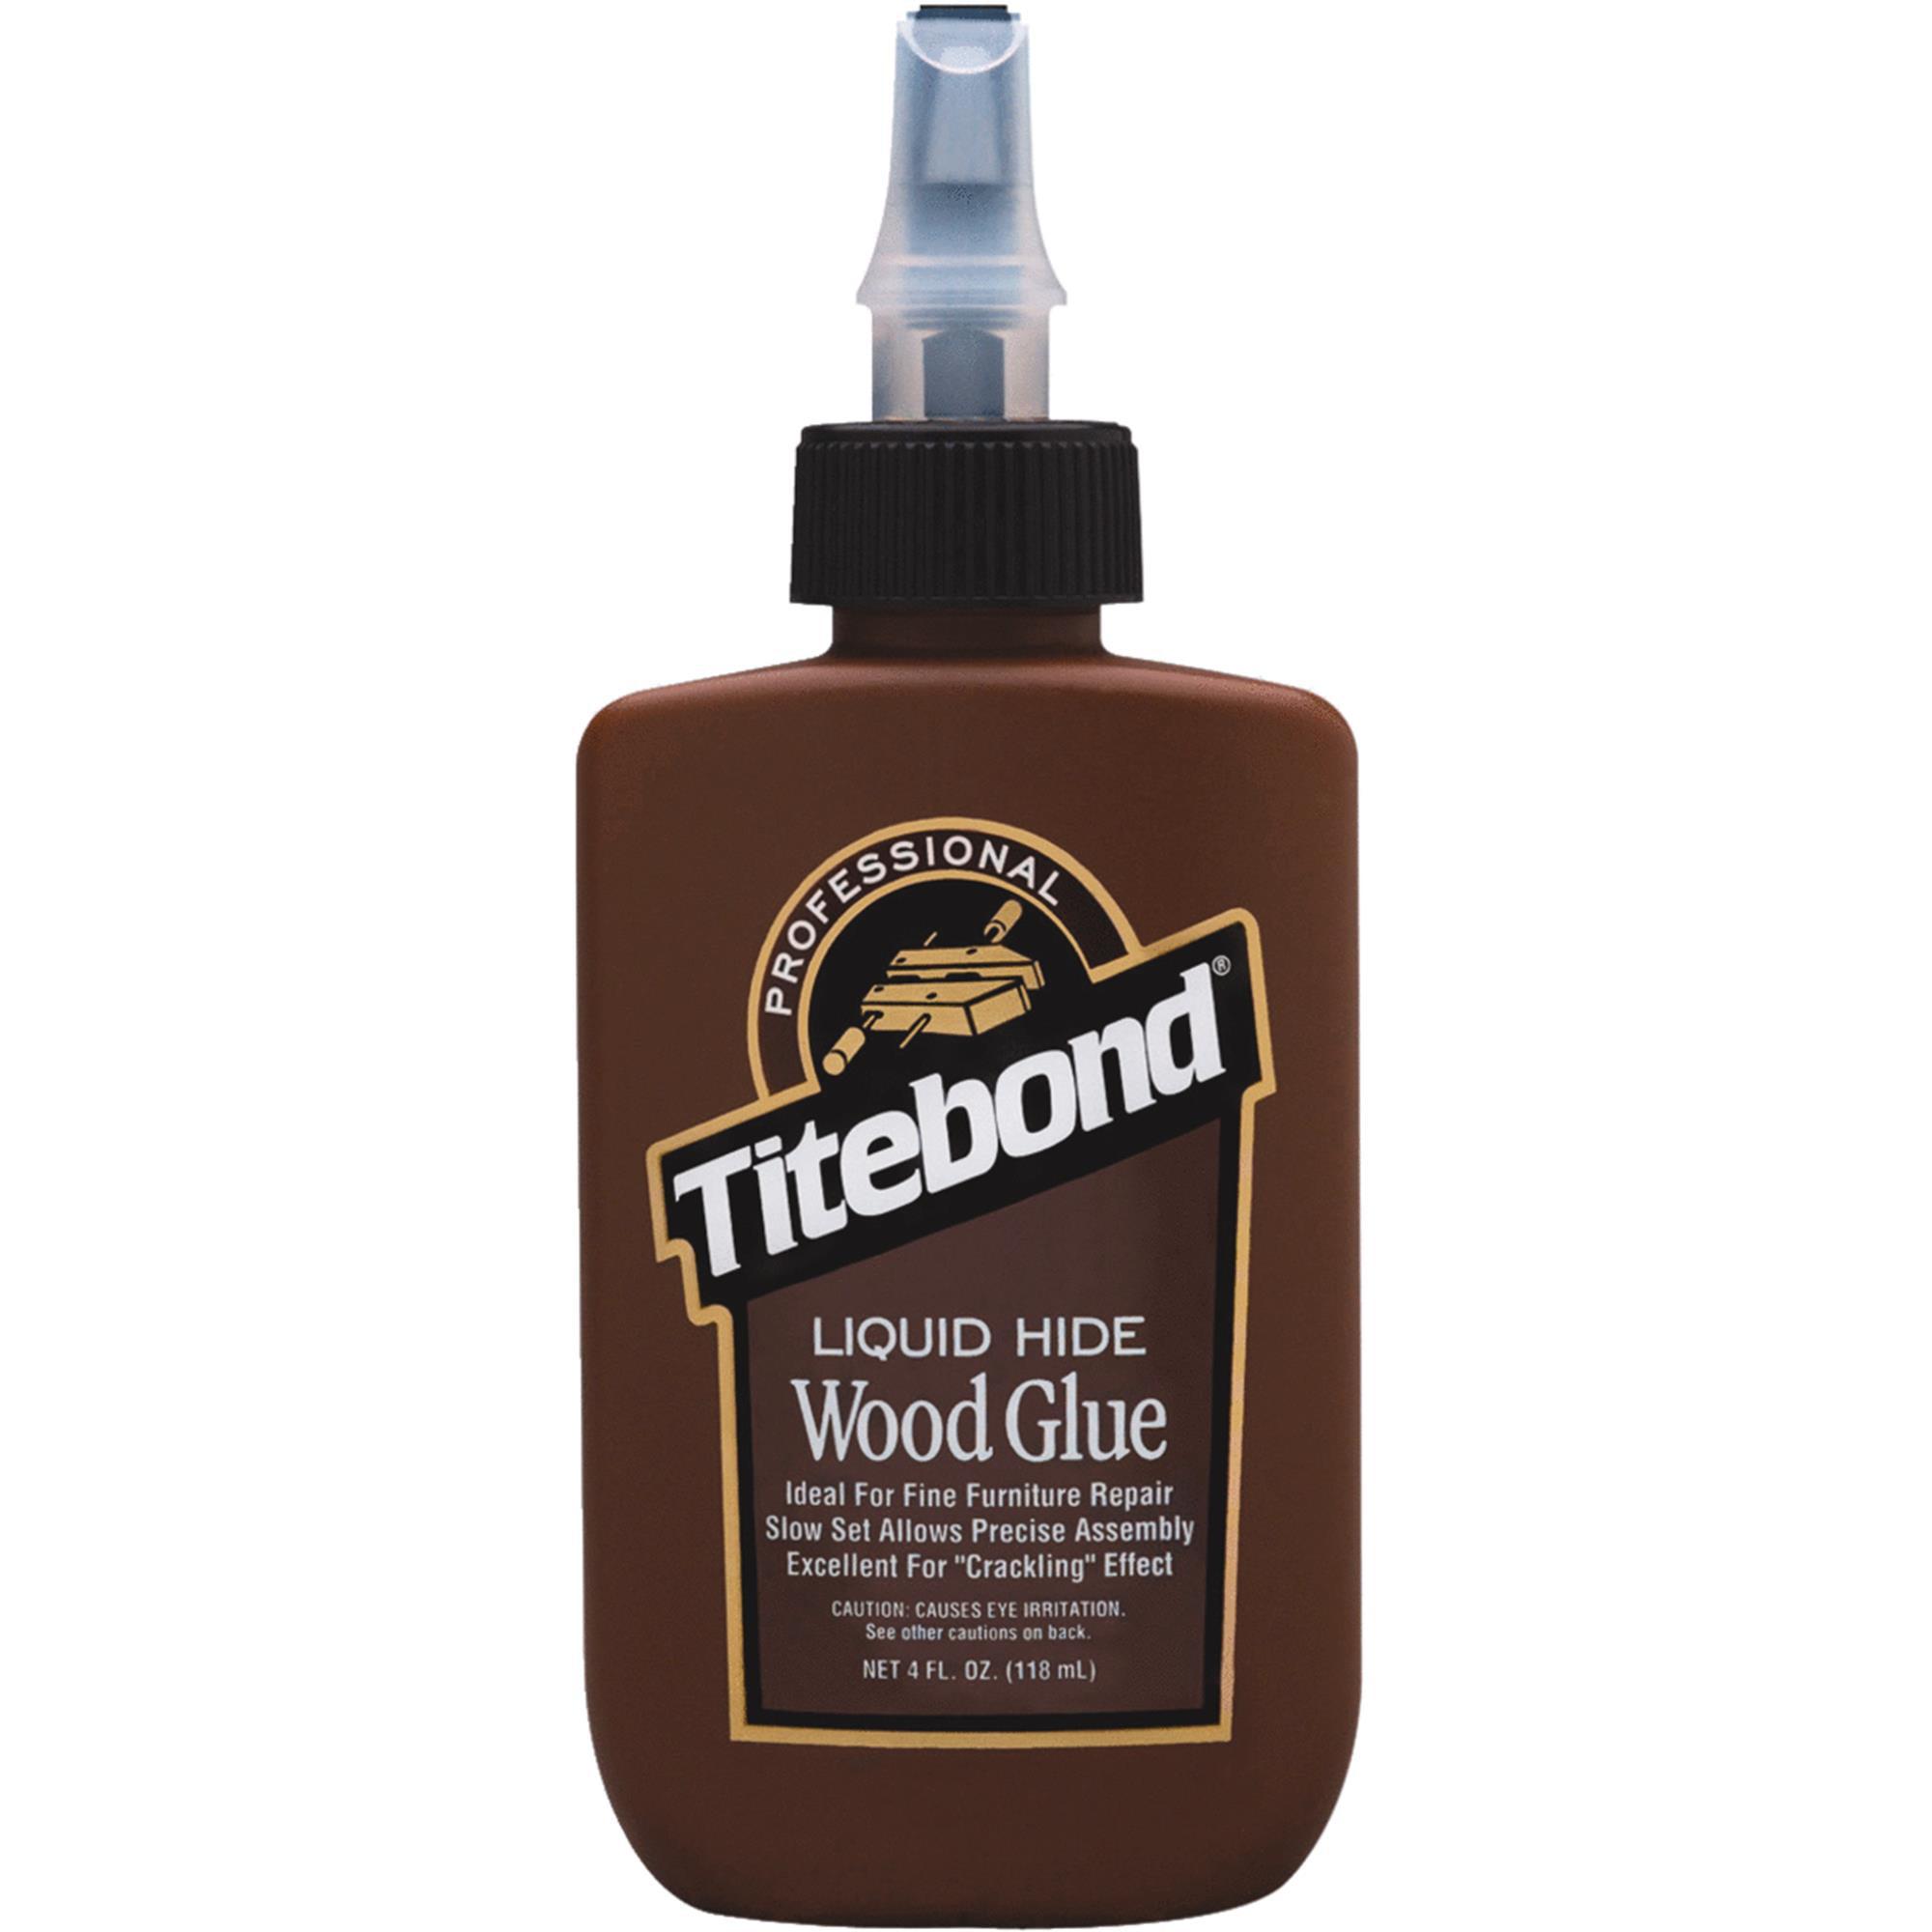 Titebond Liquid Hide Wood Glue   Walmart.com